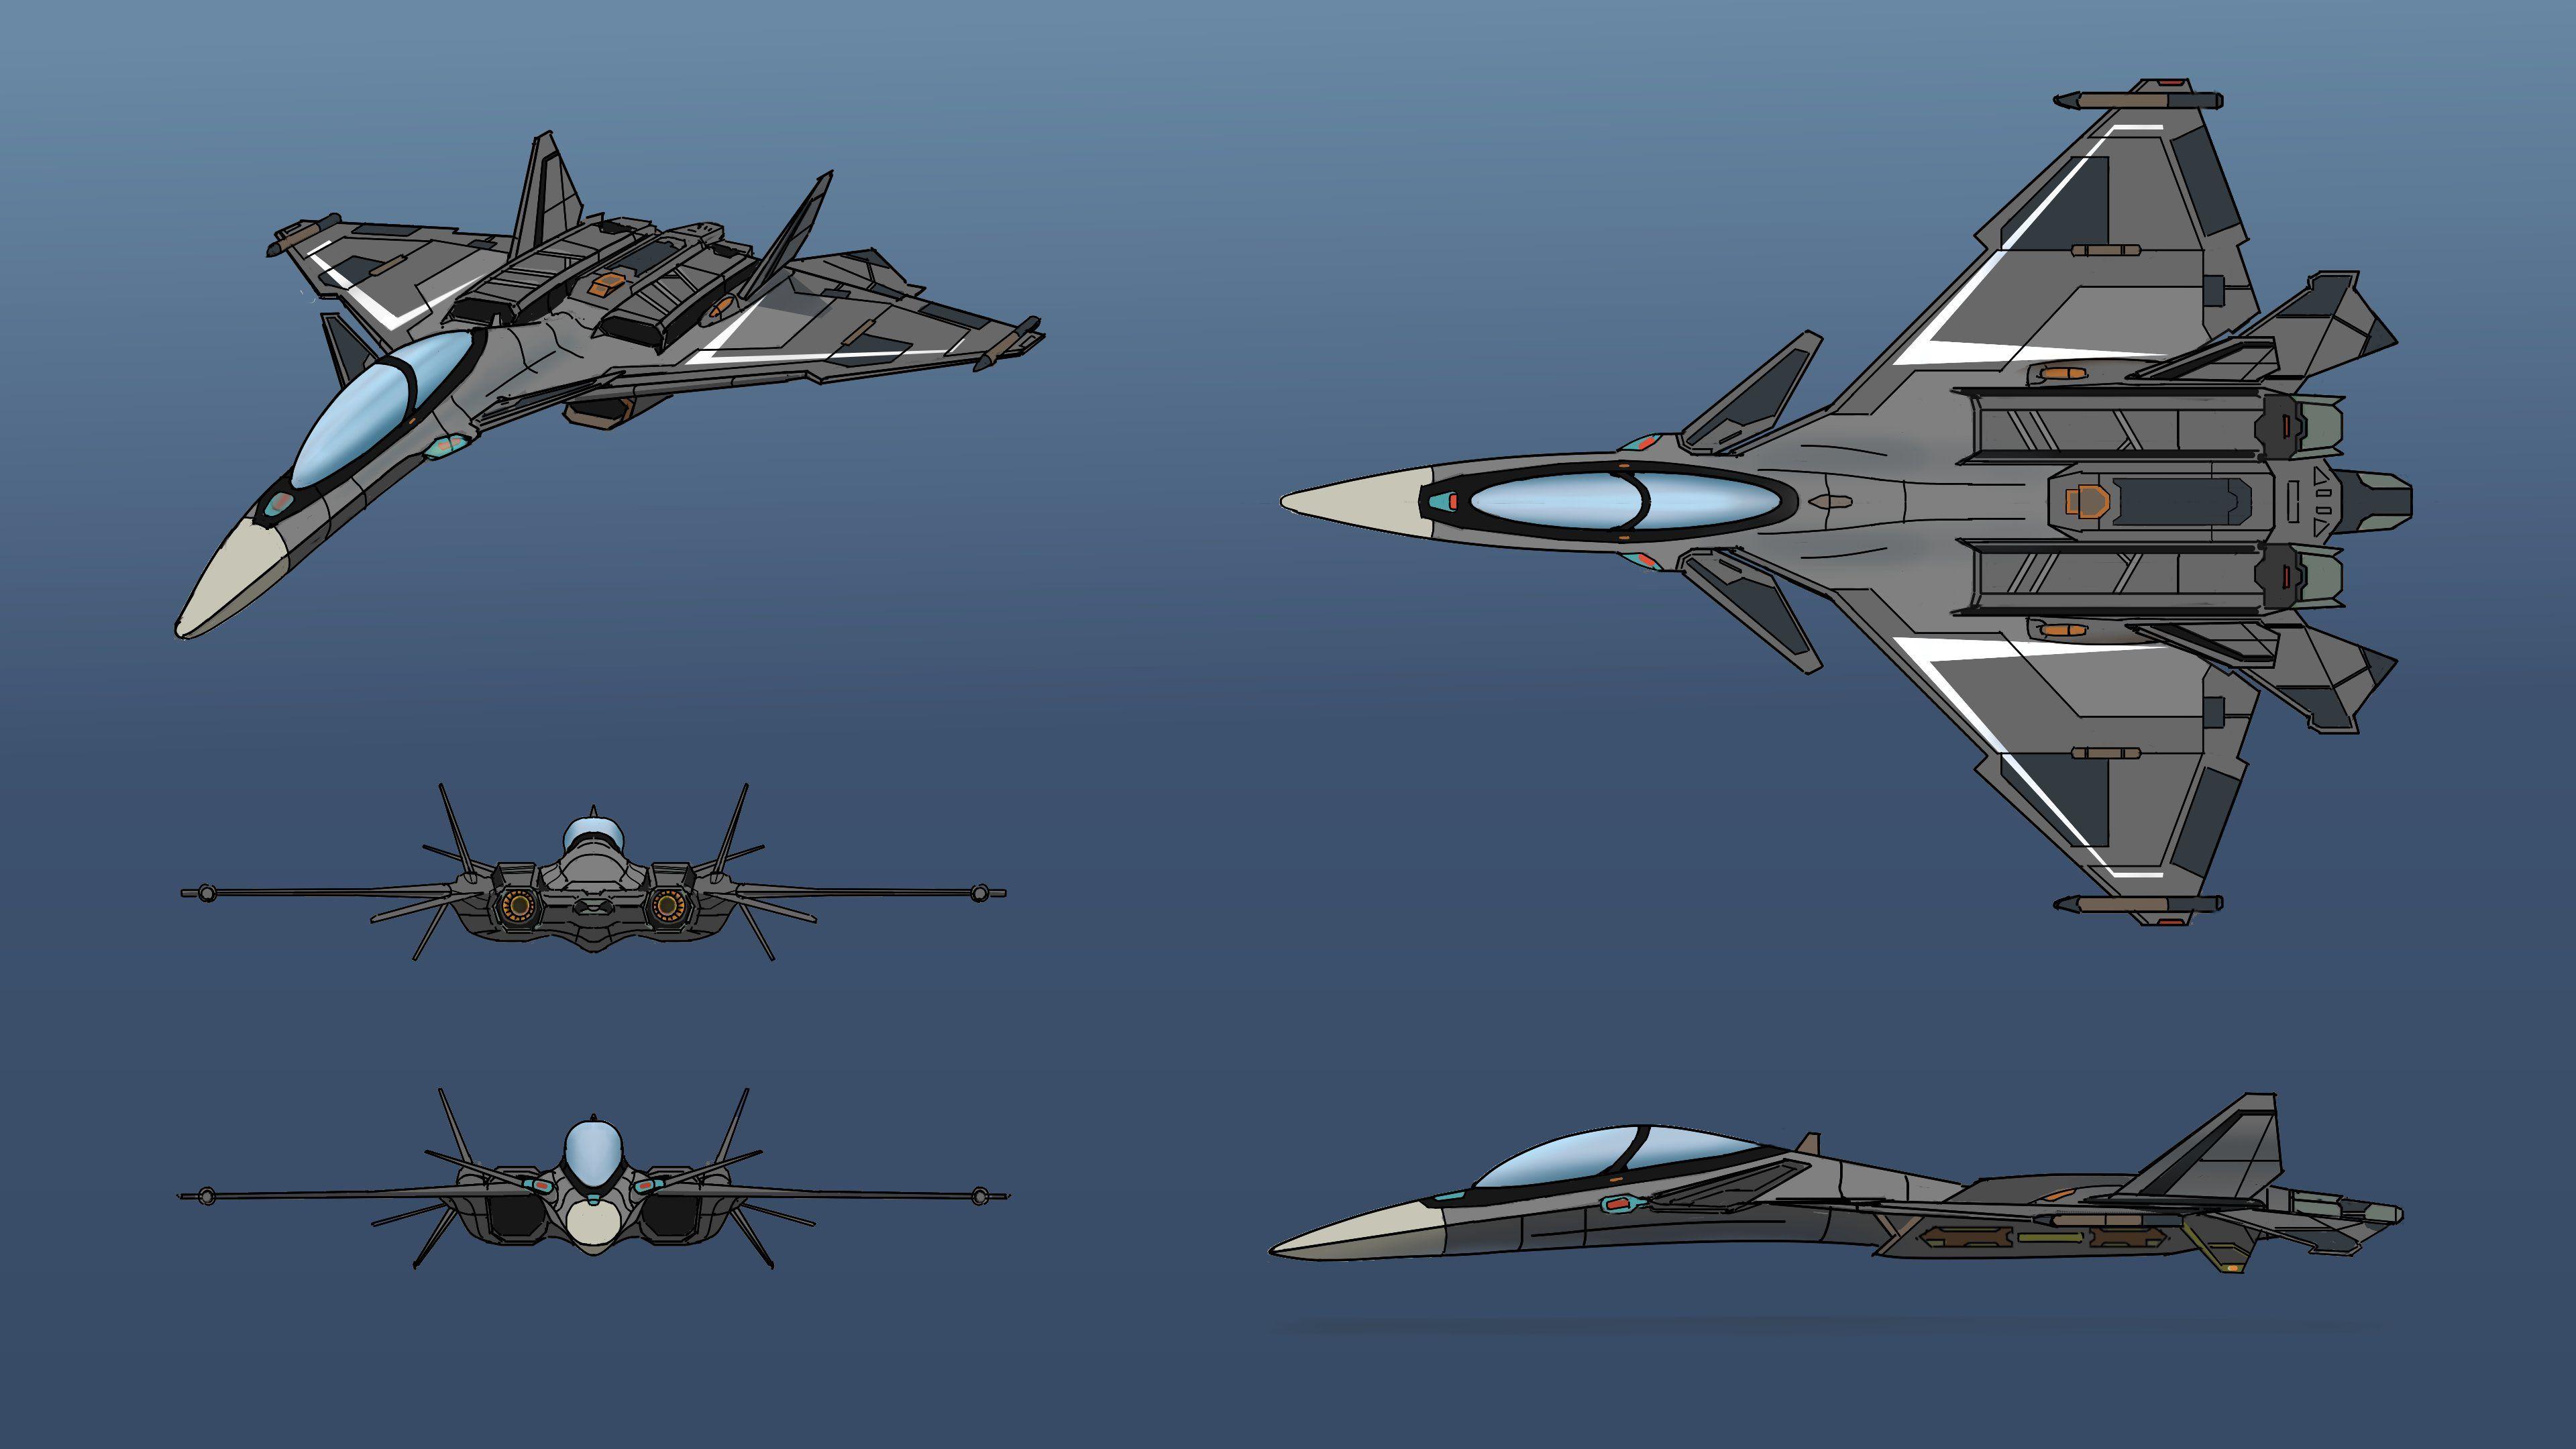 Fighter jet ortho #digitalart #digitaldrawing #digitalsketch #artists #digitalpainting #digitalillustration #PaintstormStudio #artwork #krita #conceptart #conceptdesign #gameart #plane #drawing #propdesign #paintstorm #sketch